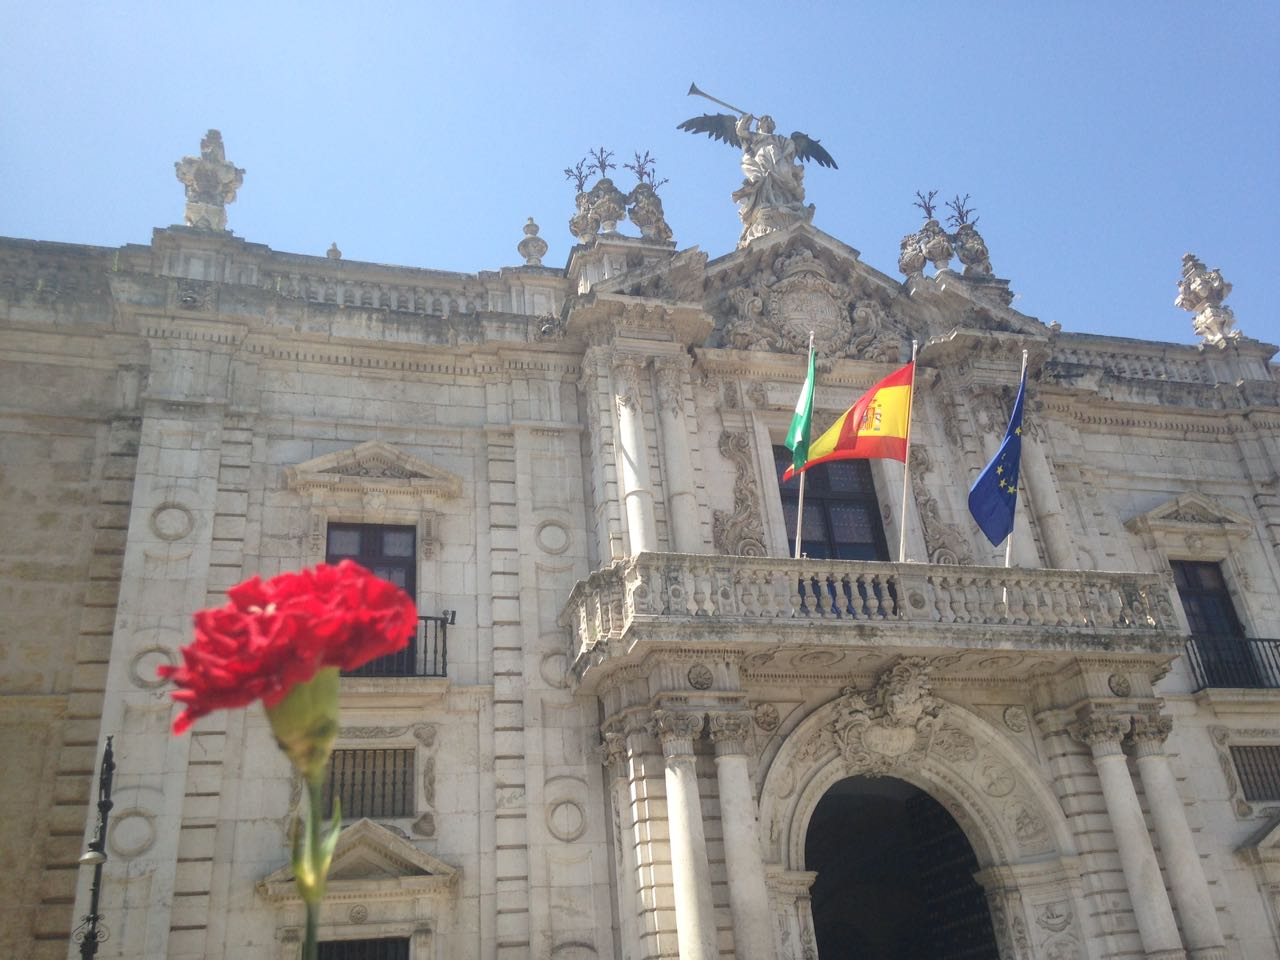 Tipps-Kurztrip-Sevilla-Handgepäck-Guide-Travel-Reiseblog-Reisen-Tabakfabrik_6